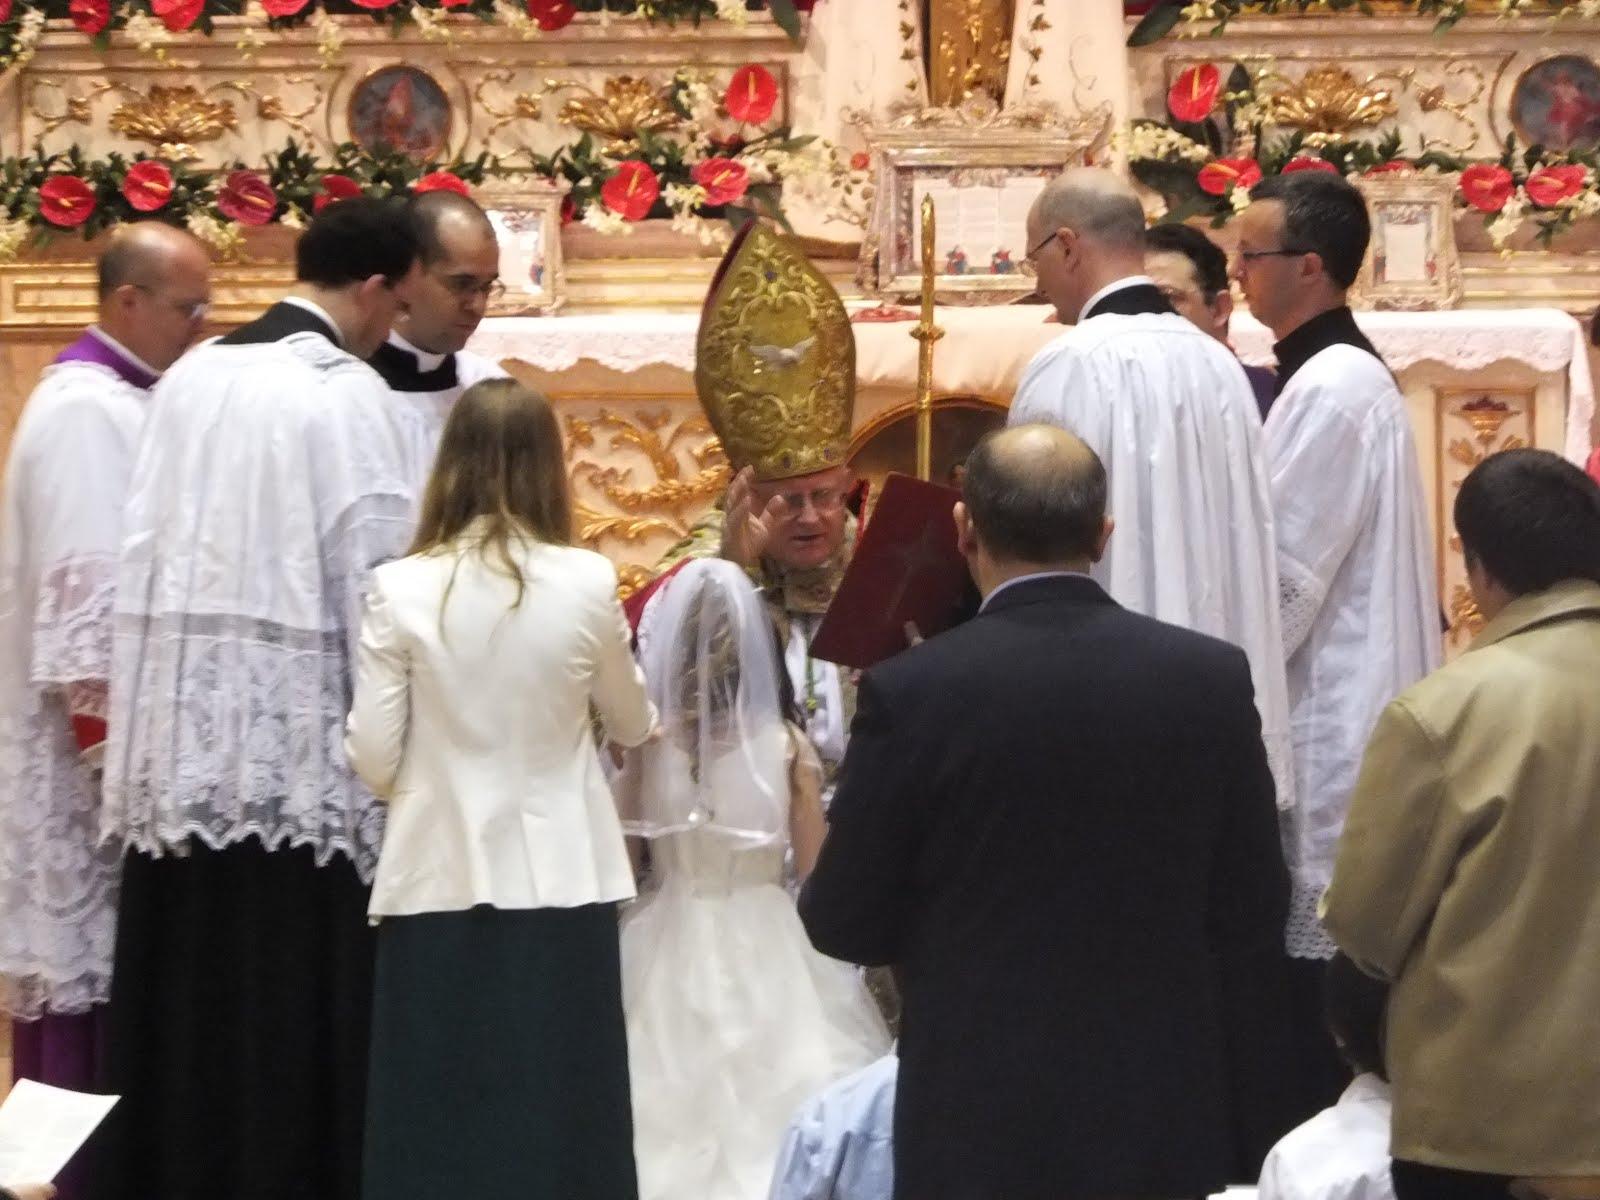 Matrimonio Rito Romano O Ambrosiano : Catholicvs santa misa tradicional en oxford reino unido